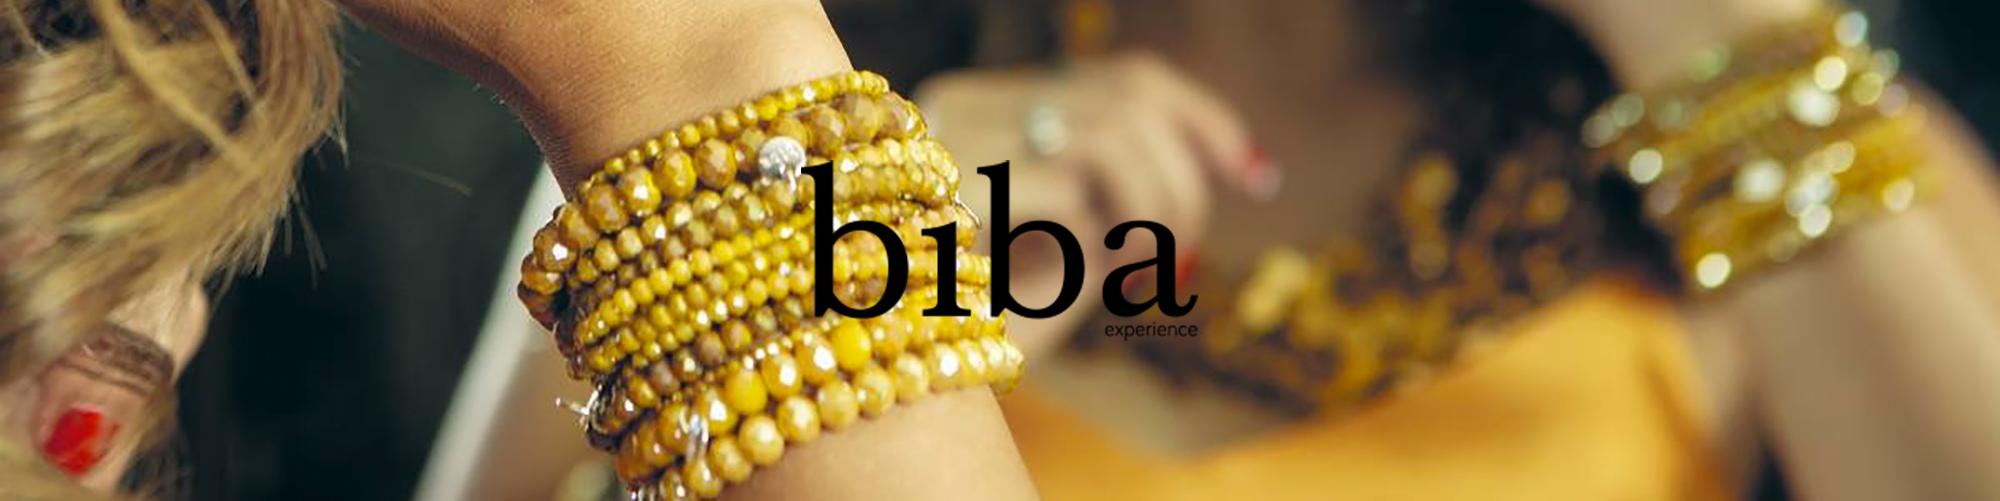 biba experience